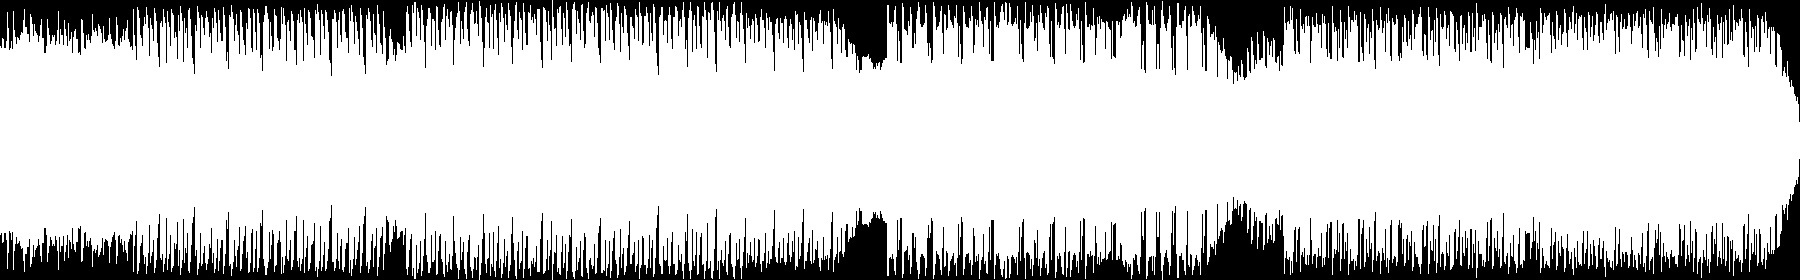 Sunny Reggaeton audio waveform